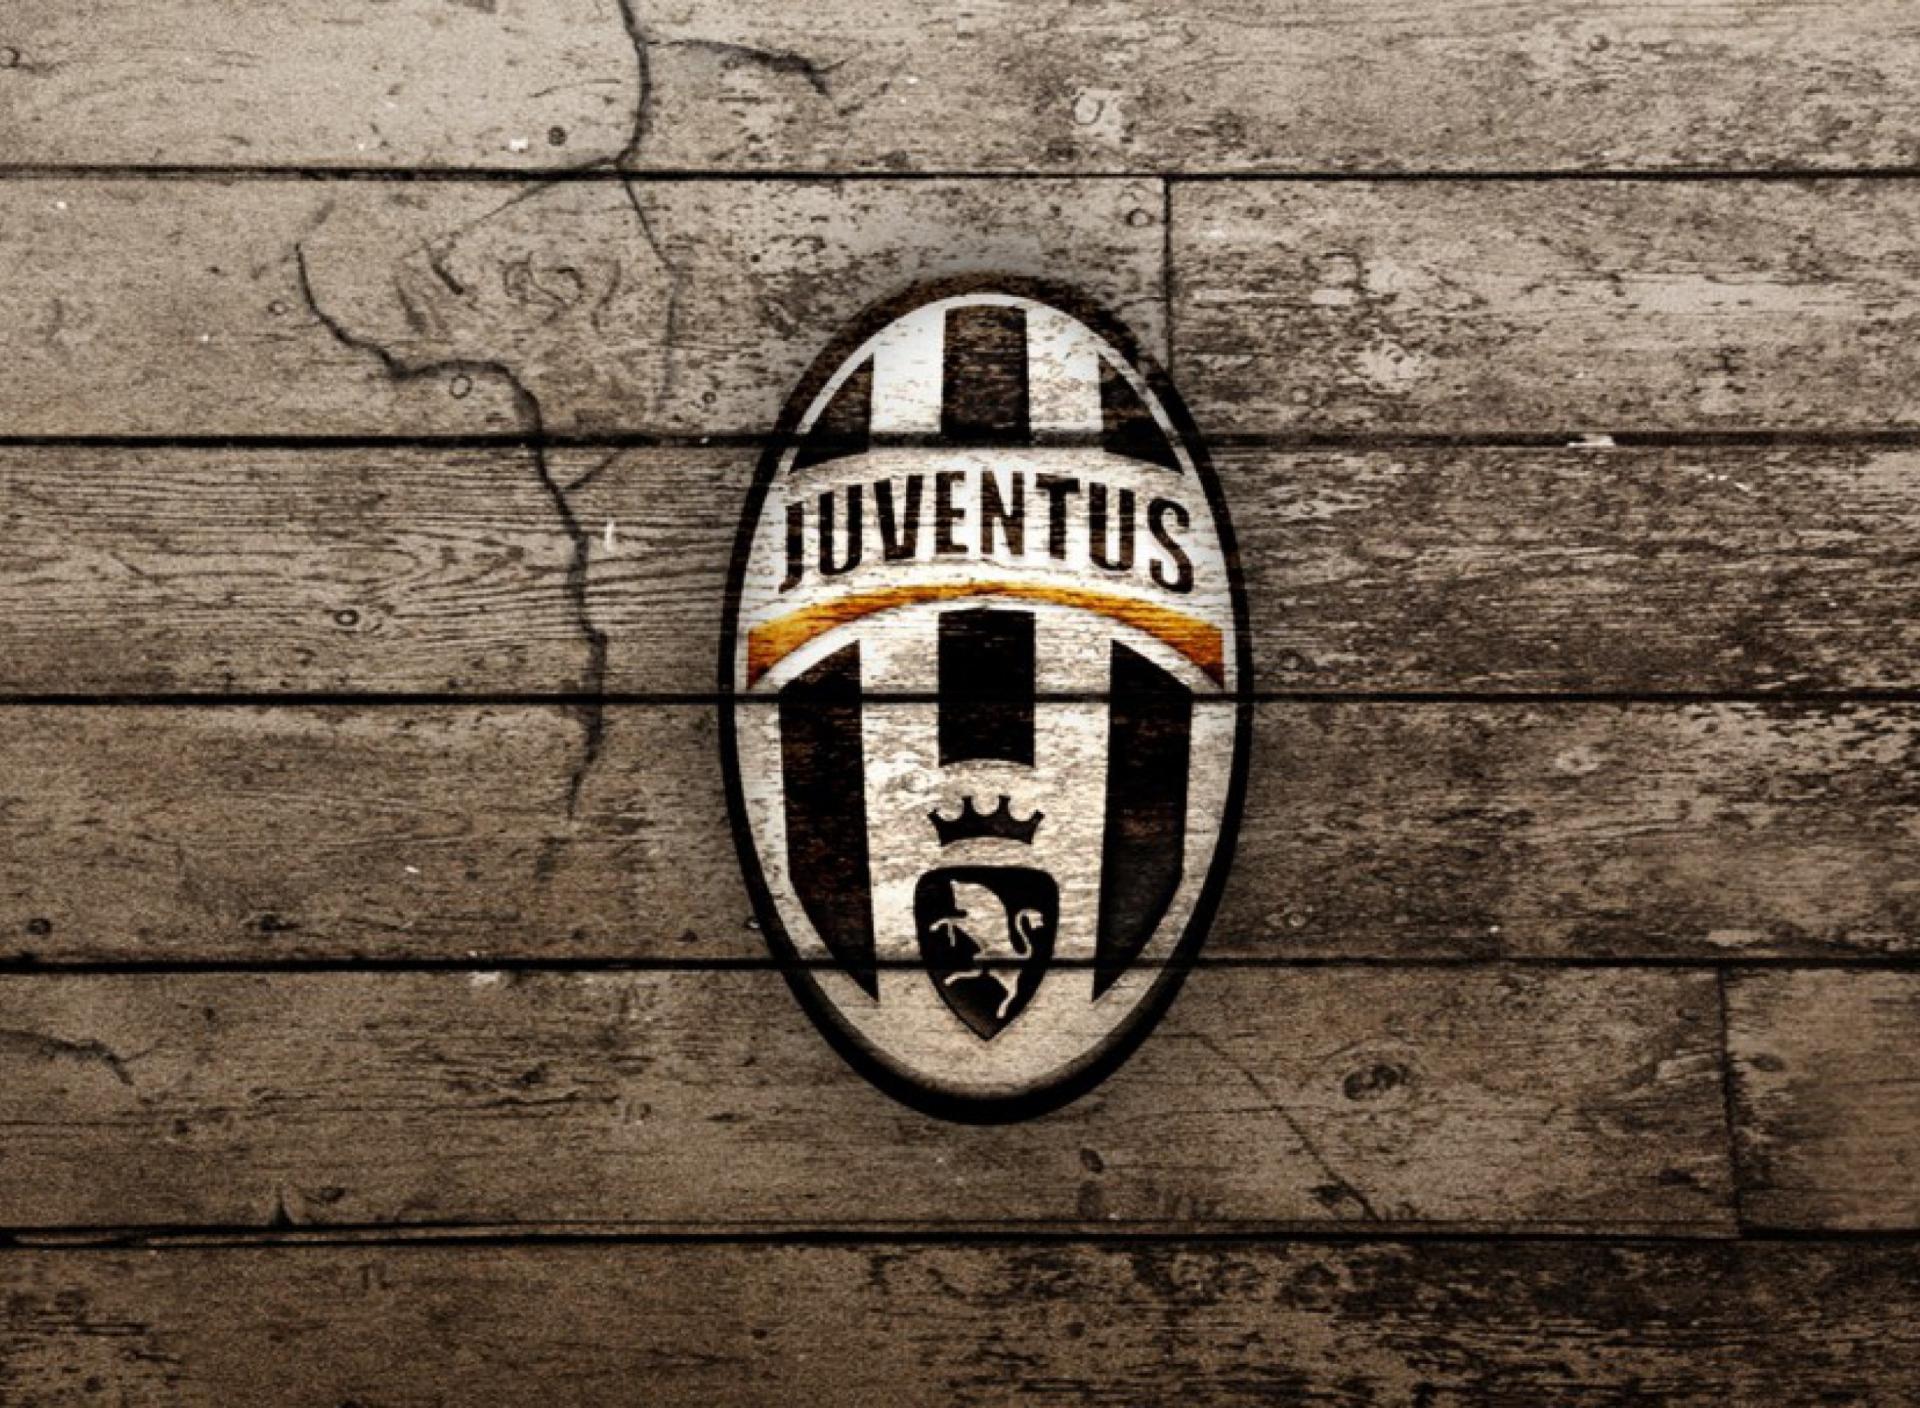 Juventus sfondi gratuiti per huawei p8 for Sfondi animati juventus